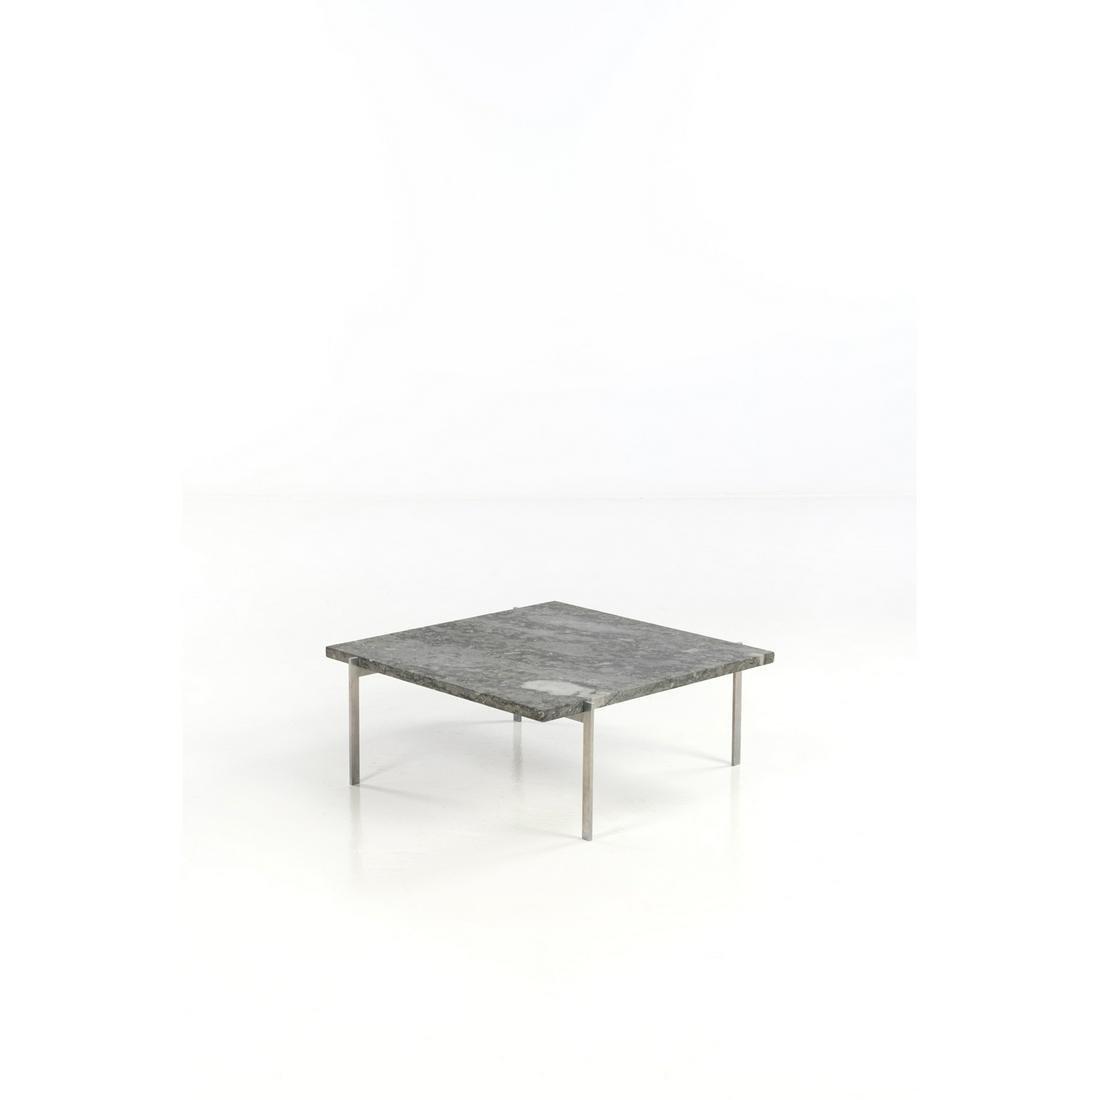 Poul Kjaerholm (1929-1980) Coffee table Matt chrome